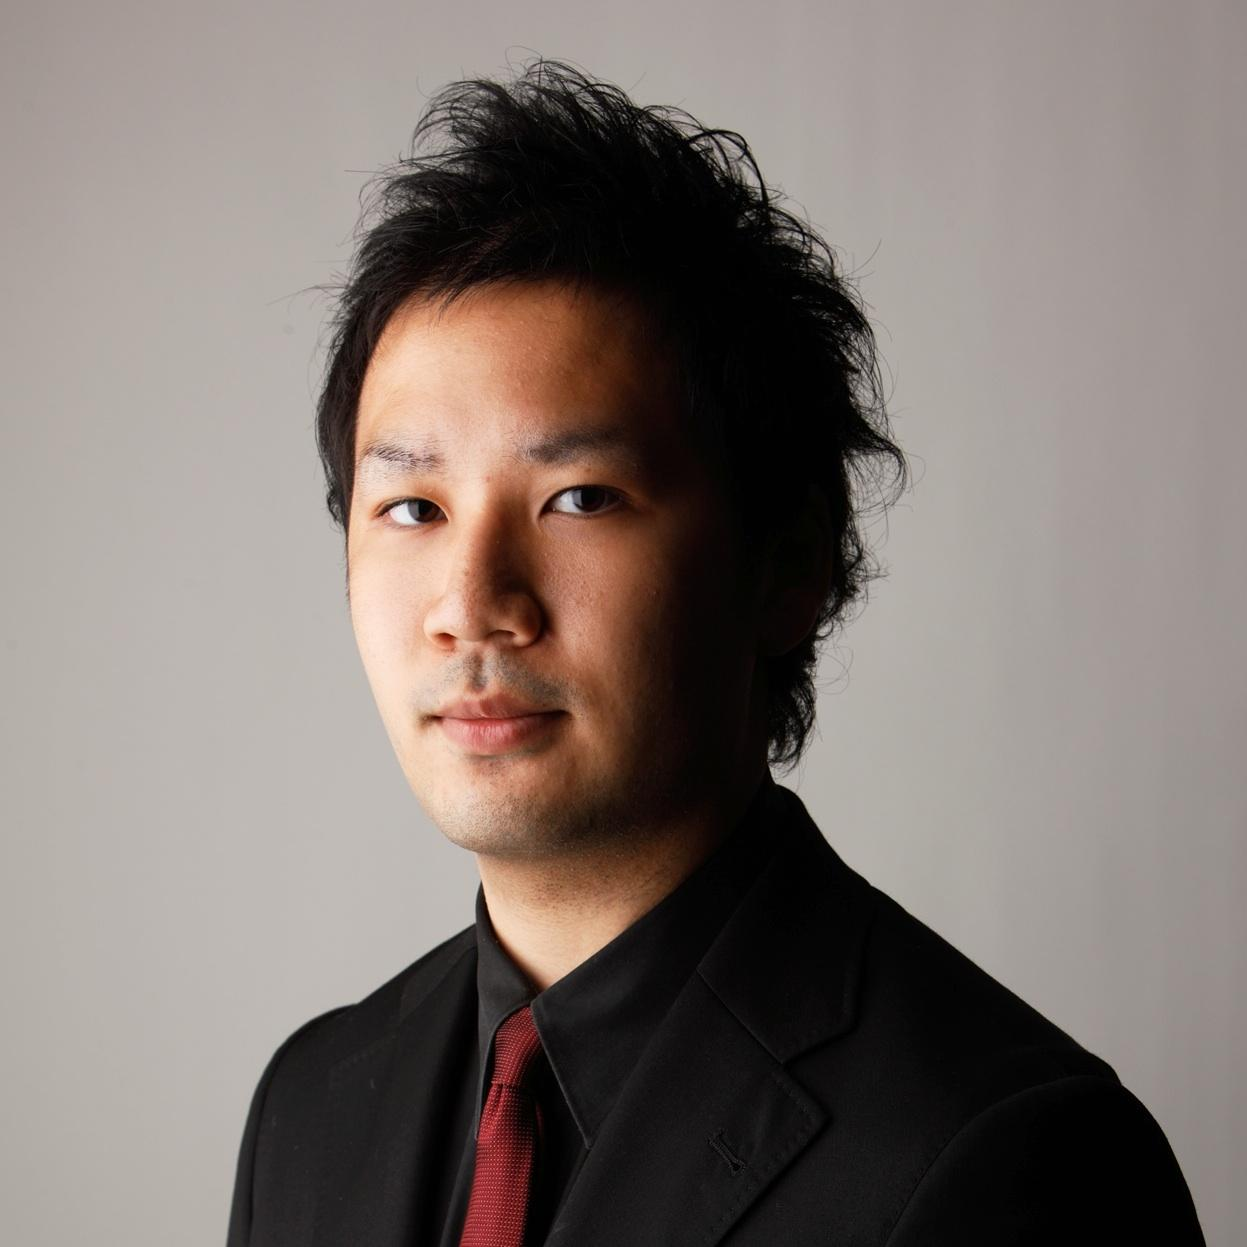 TVアニメ「ロボットガールズZ」キャラソン編曲担当   作曲家×福廣 秀一朗